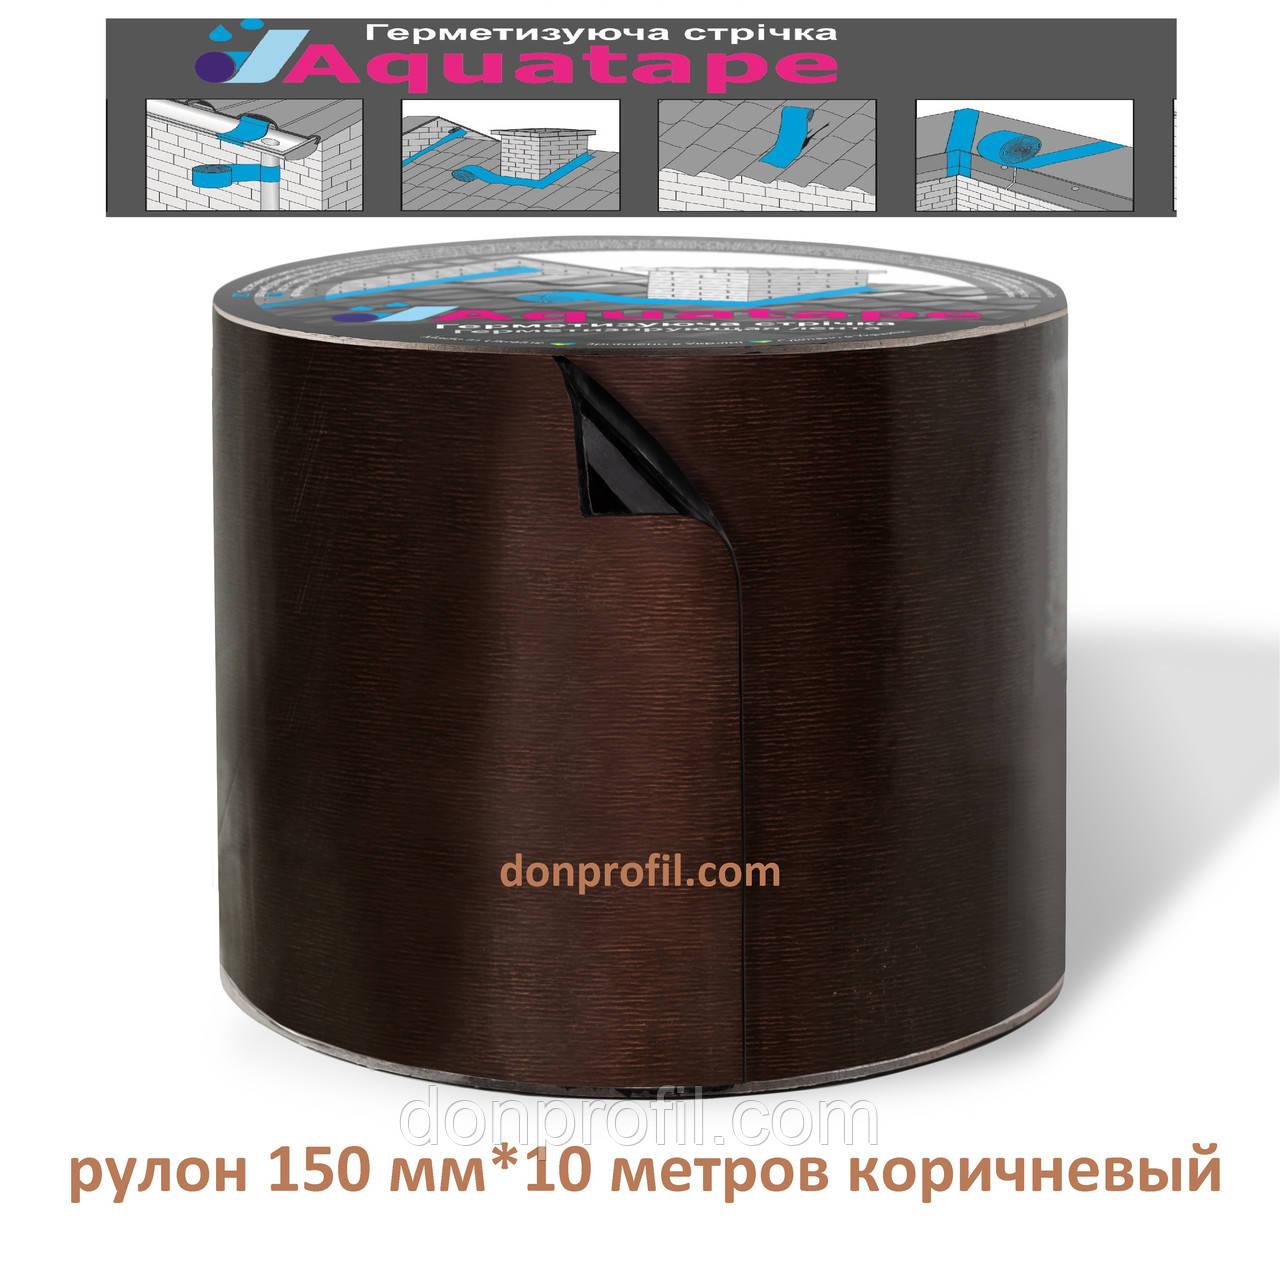 Стрічка AquaTape 150мм*10м/рулон герметизуюча бутилкаучукова